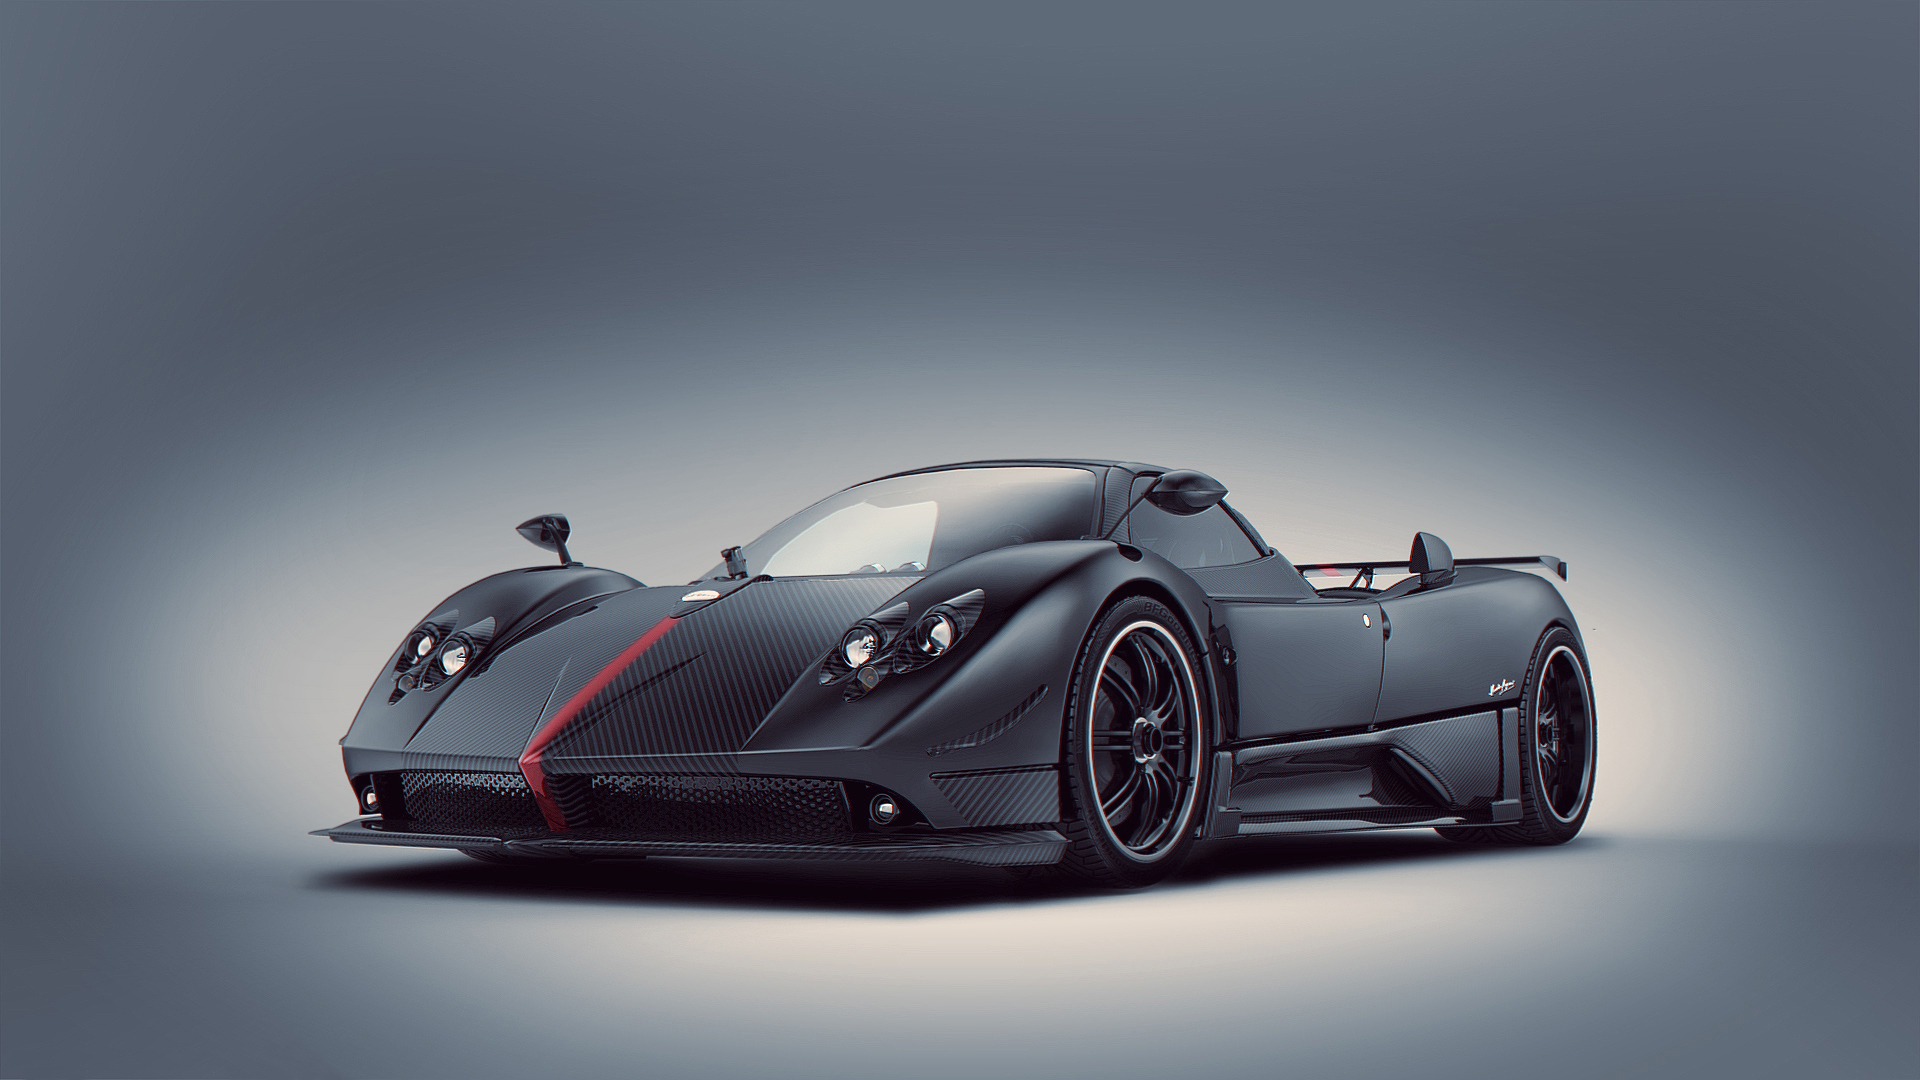 Black And Red Pagani Zonda R Cars